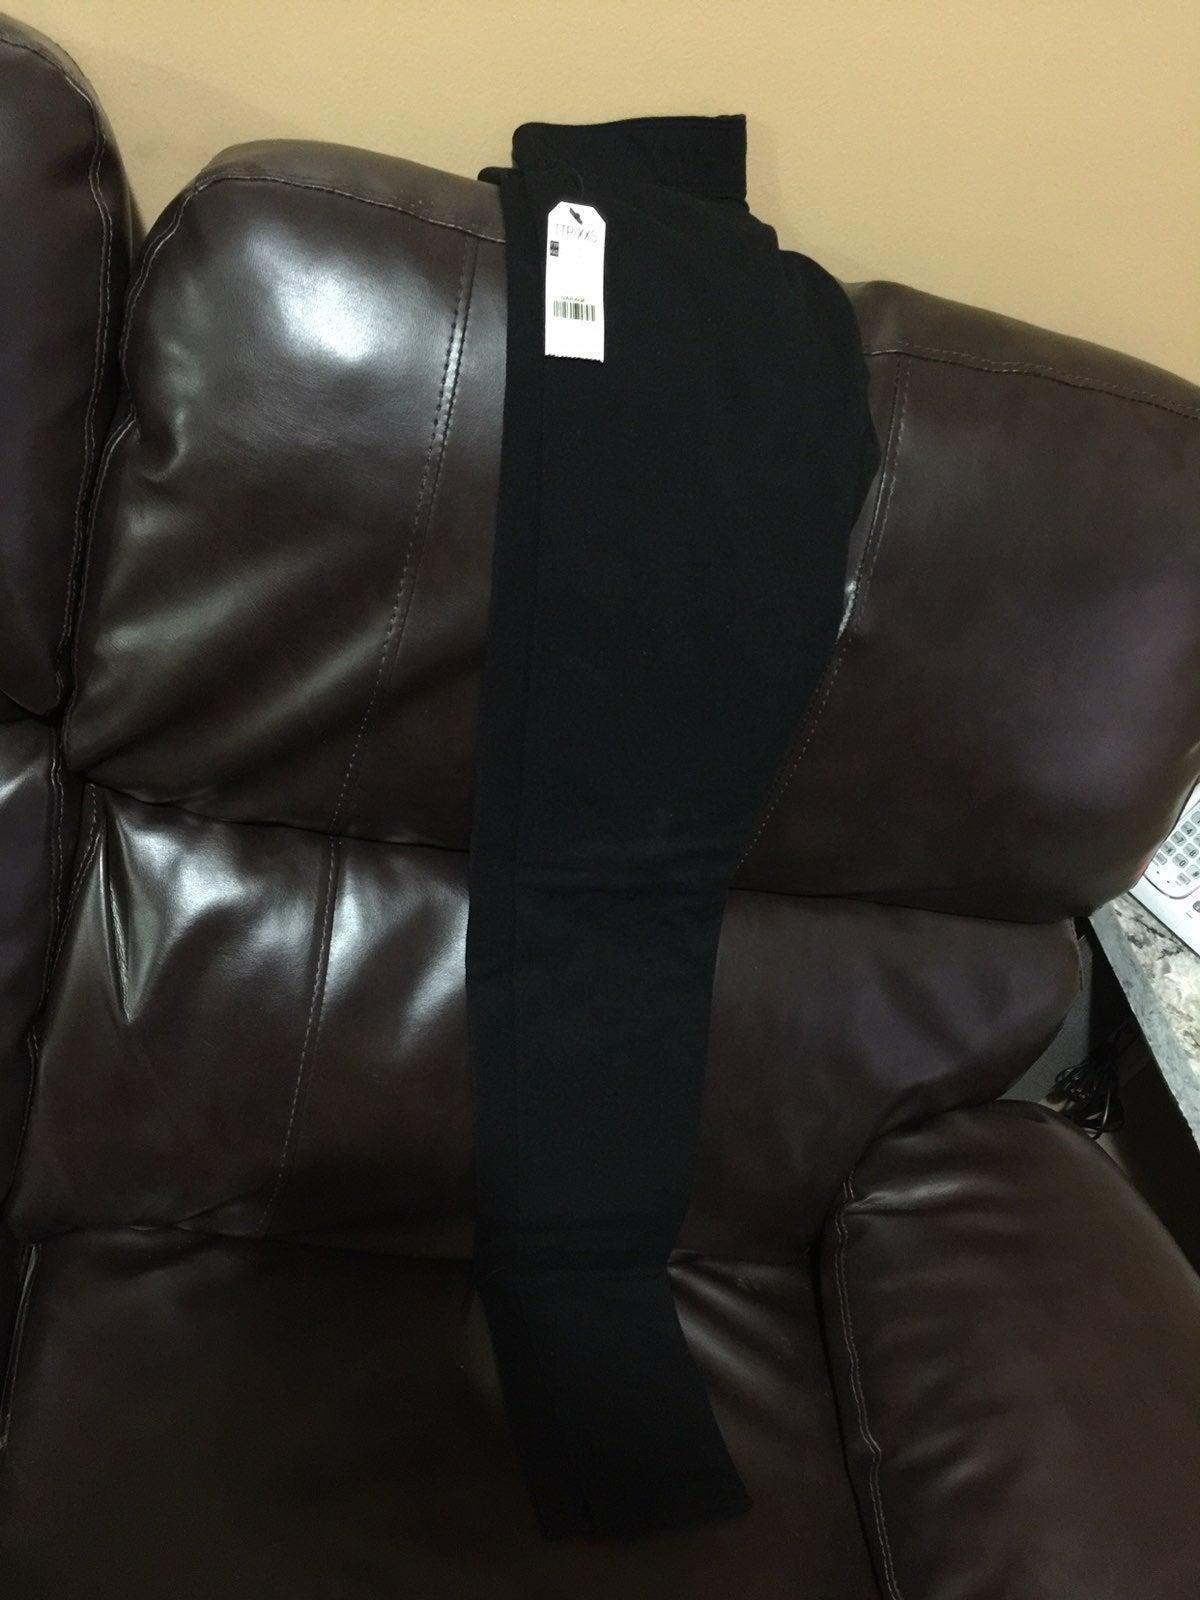 leggins / pants